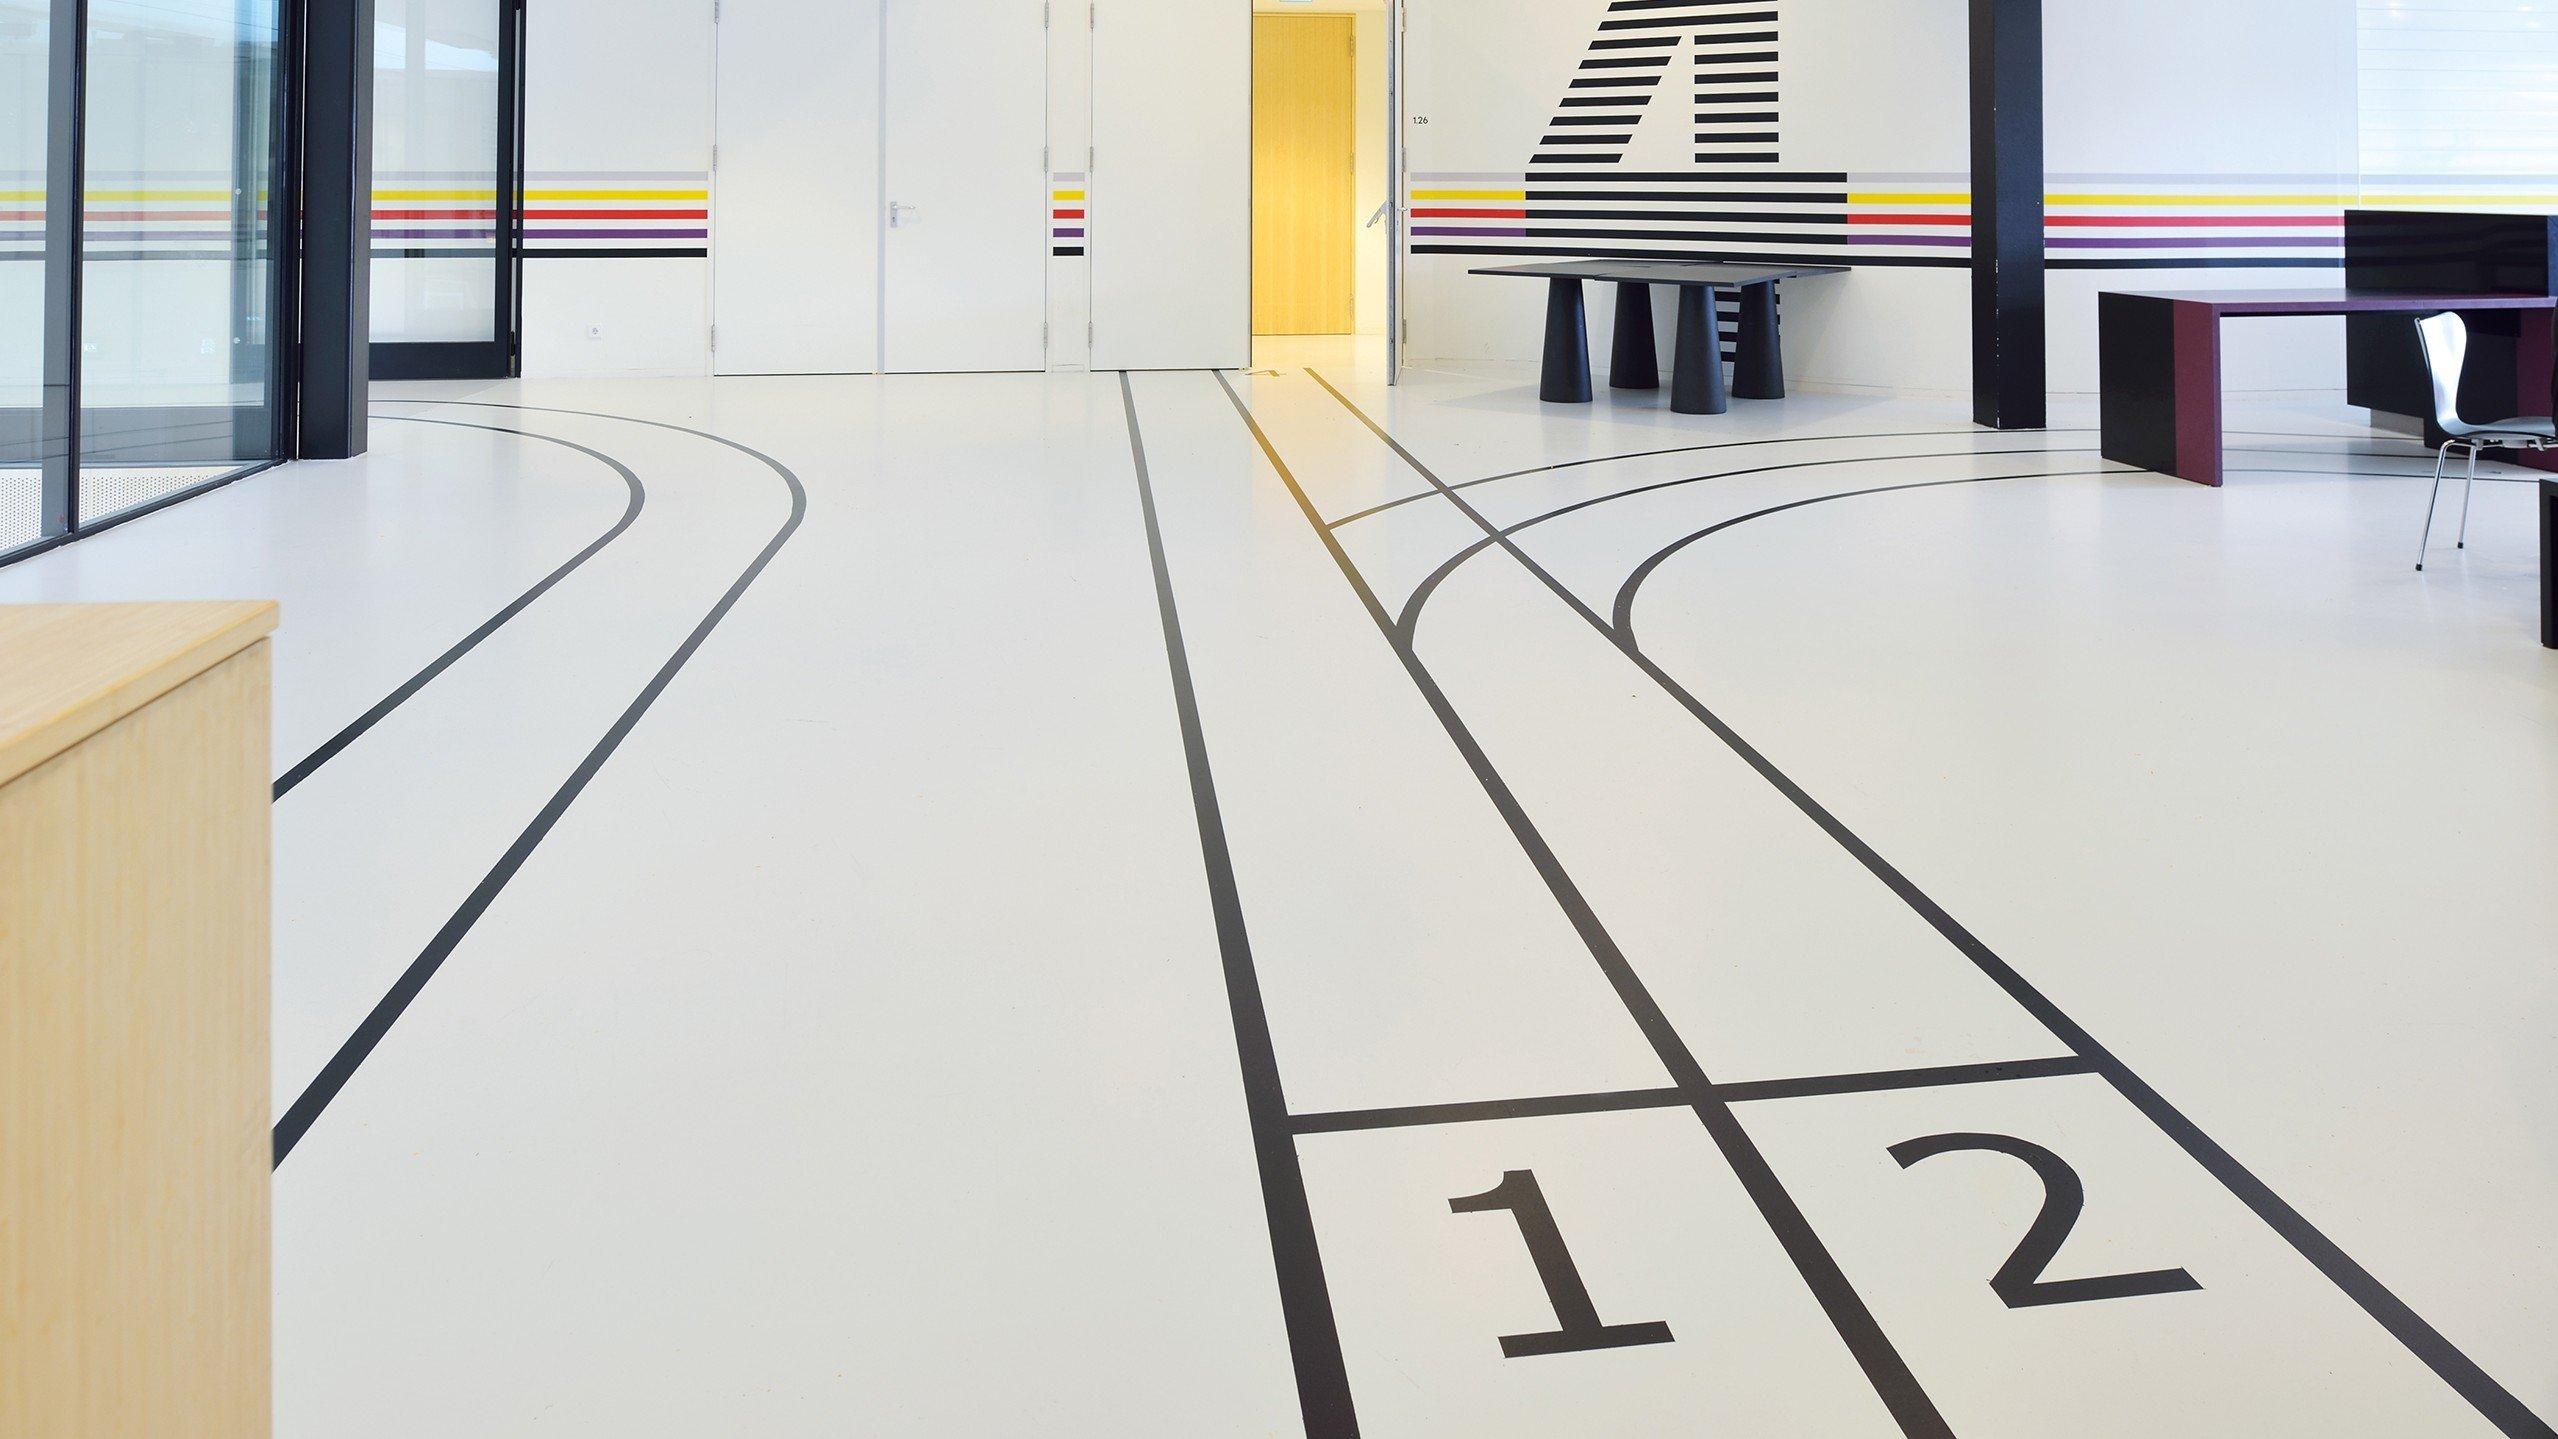 Fontys Sporthogeschool Eindhoven Bolidtop 525